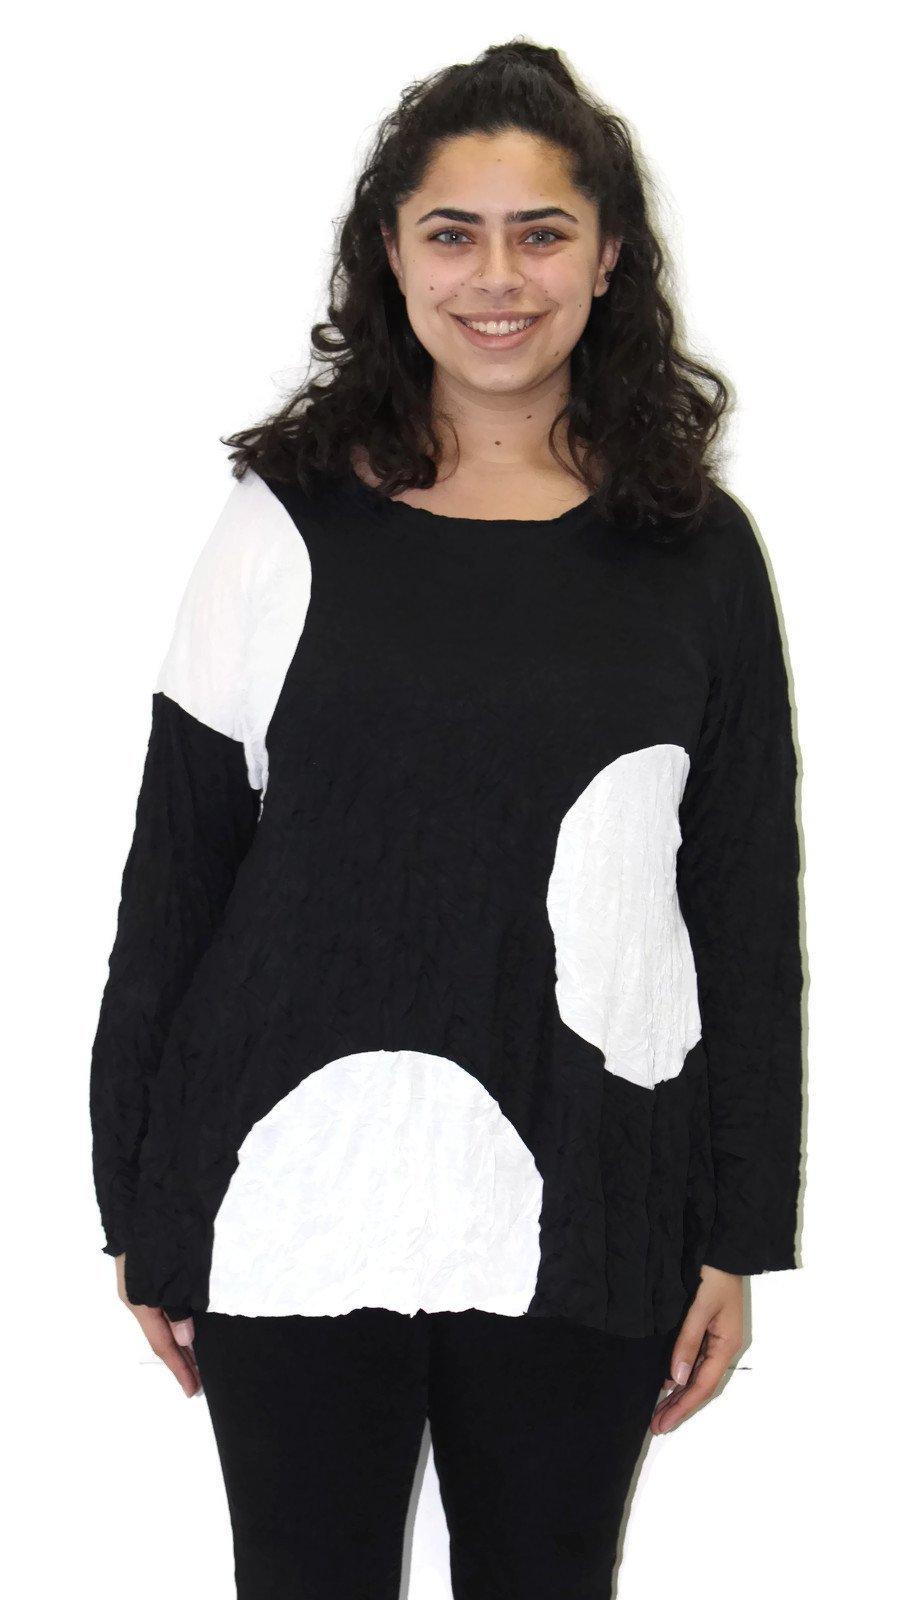 Comfy USA Women's Crinkle Black & White Circle Tunic Reg & Plus (3X, Black & White)